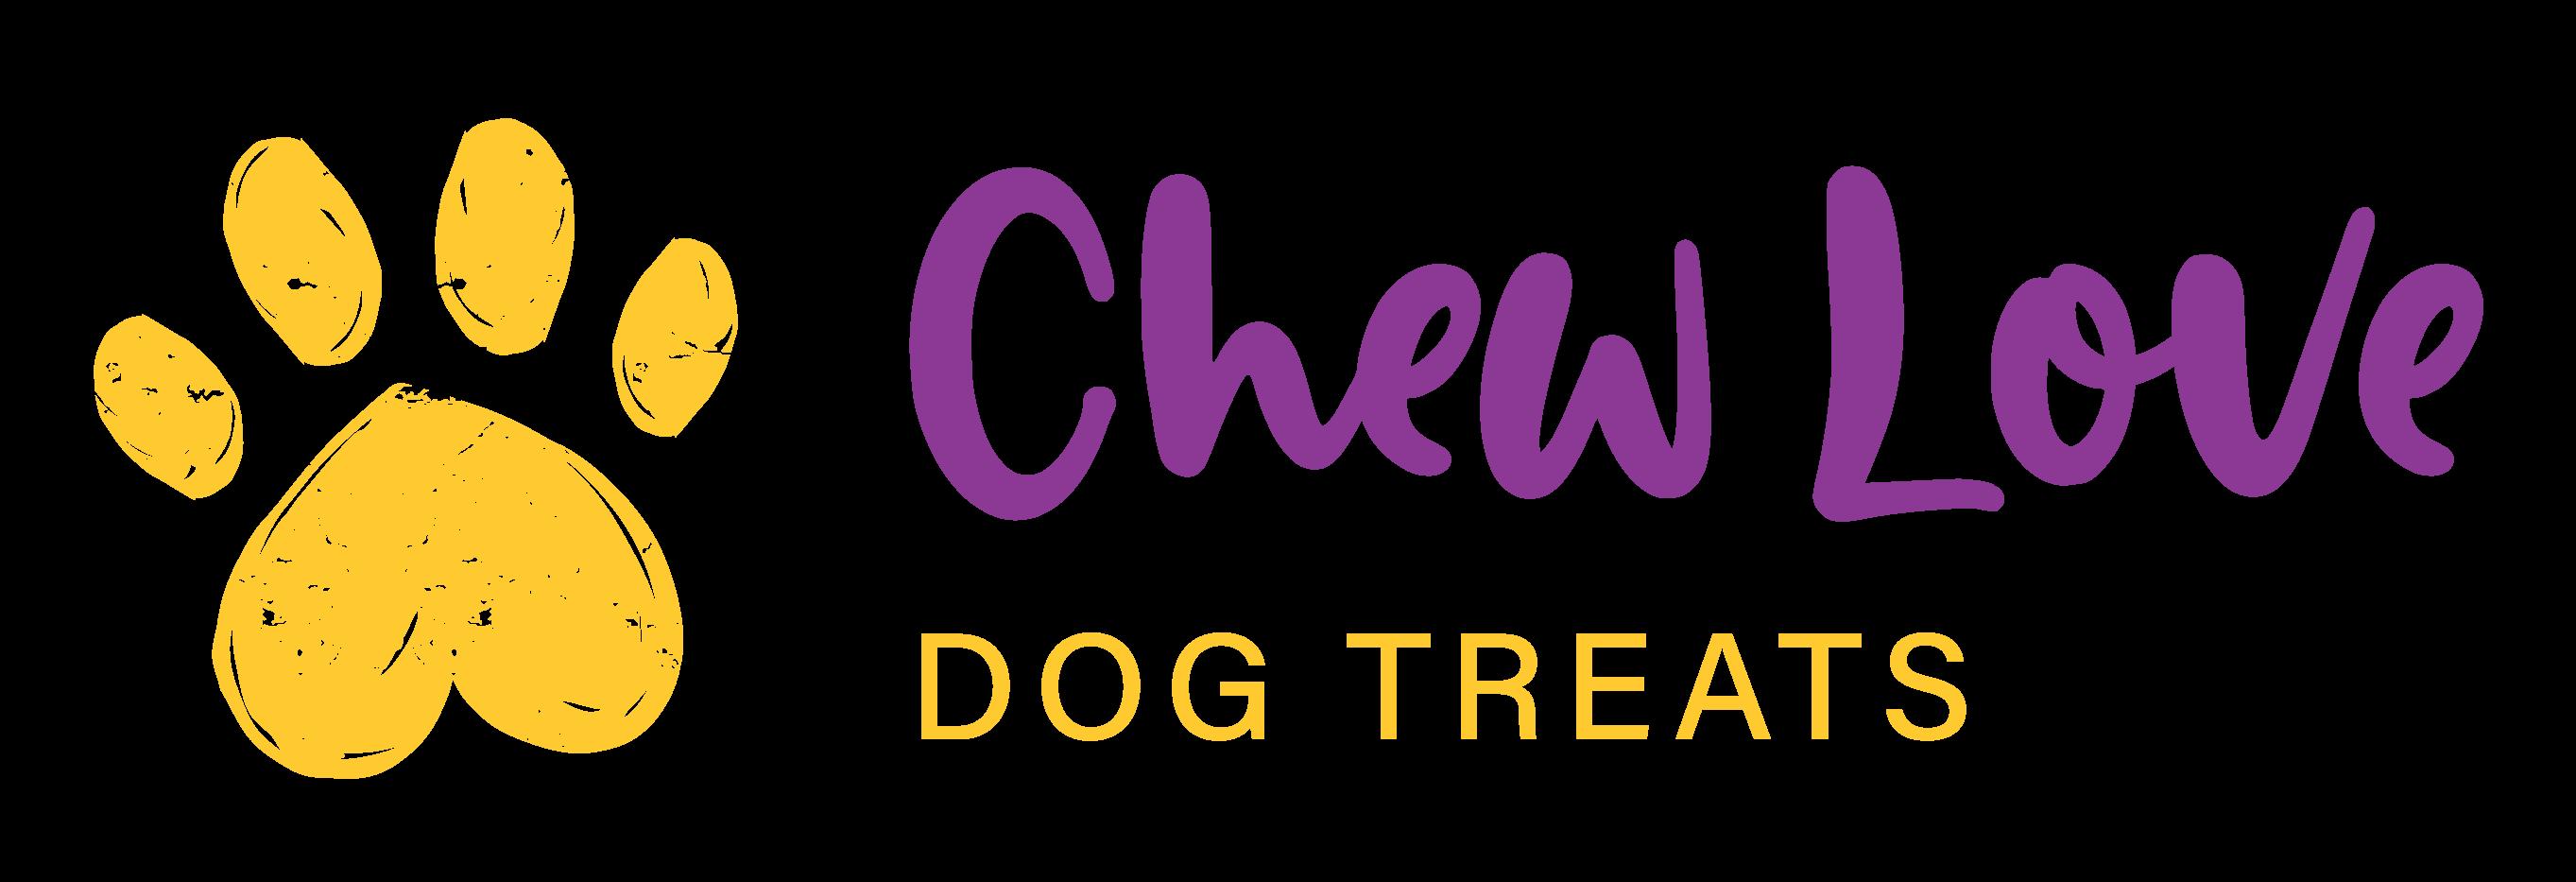 Chewlovedogtreats.com